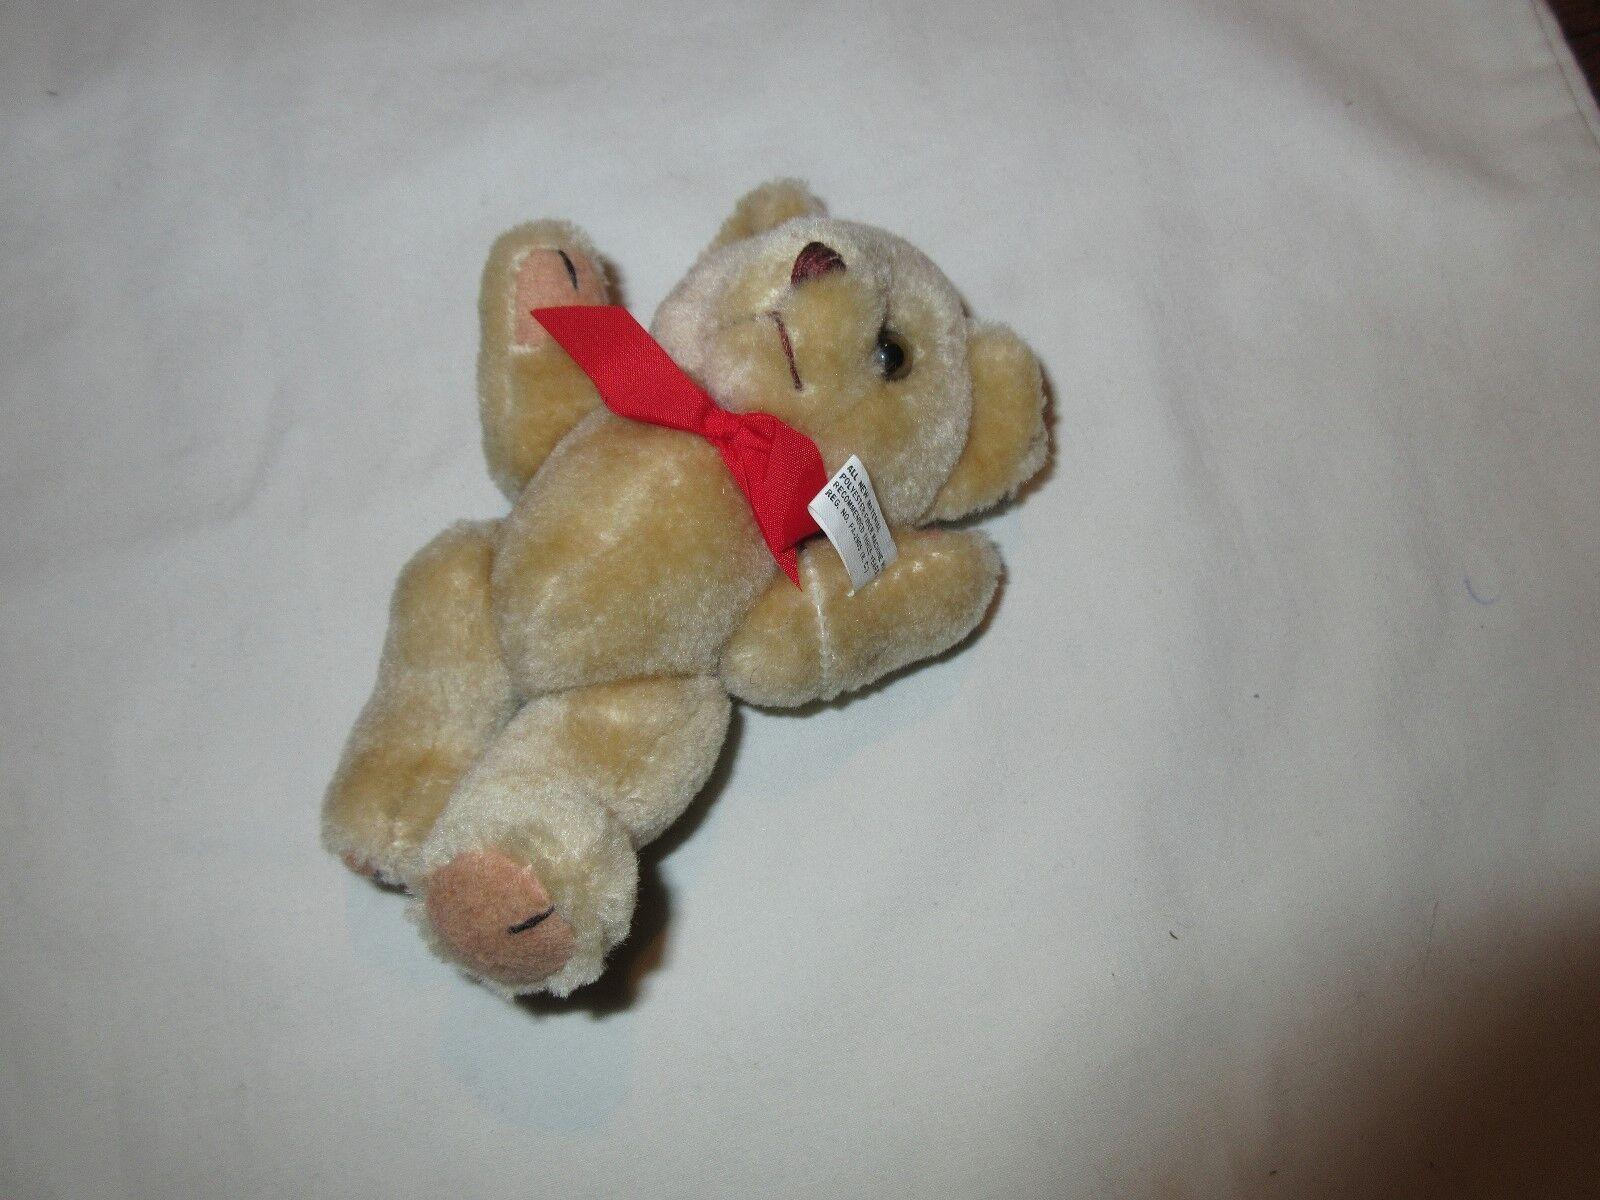 Stuffed Animal, Minitature Teddy Bear, 608802110820